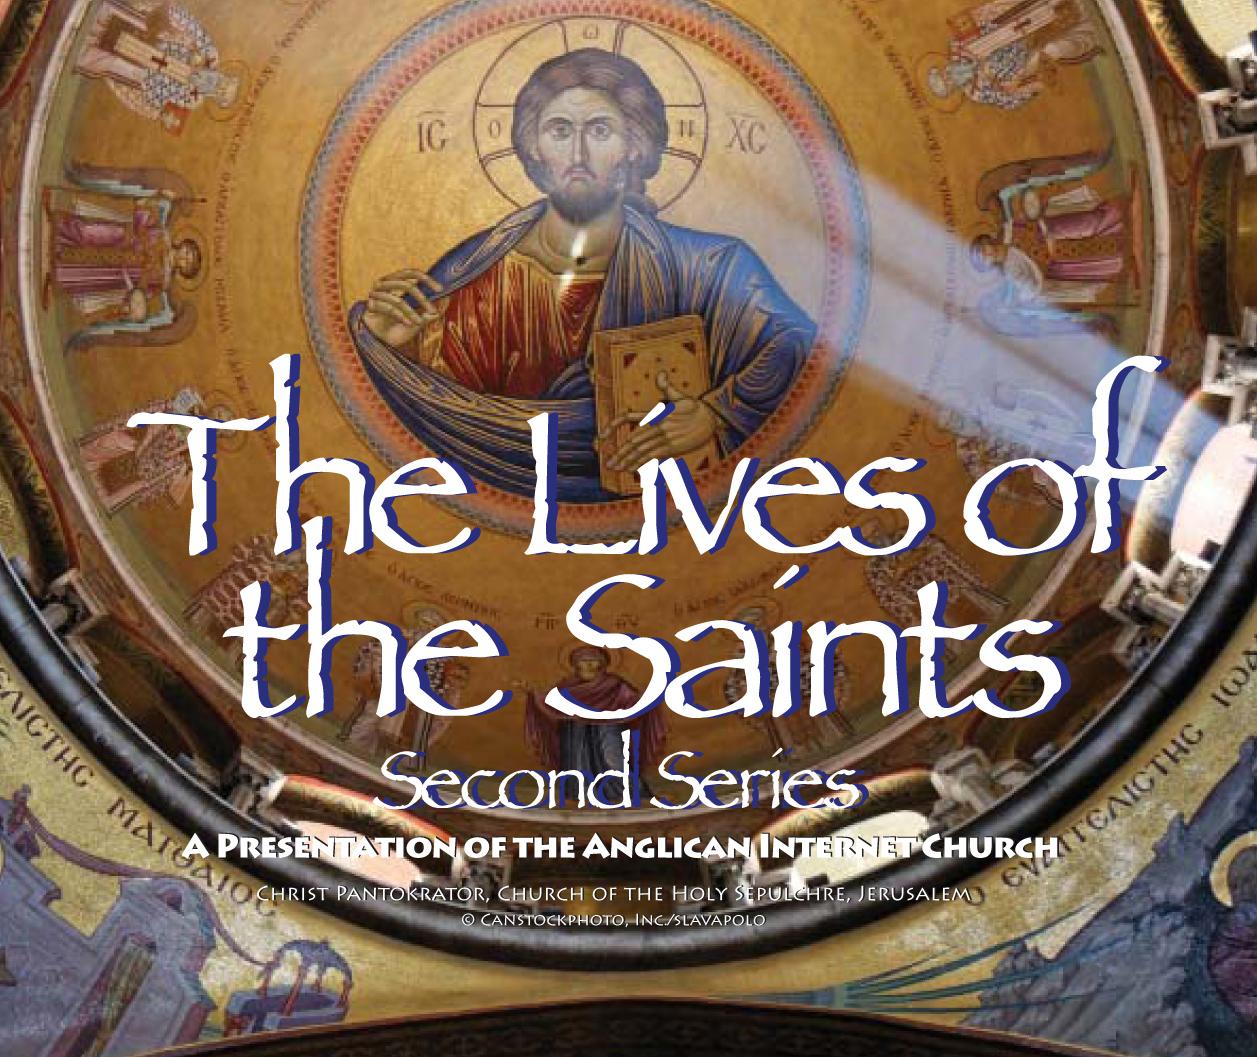 Saints2-Title1-smaller.jpg